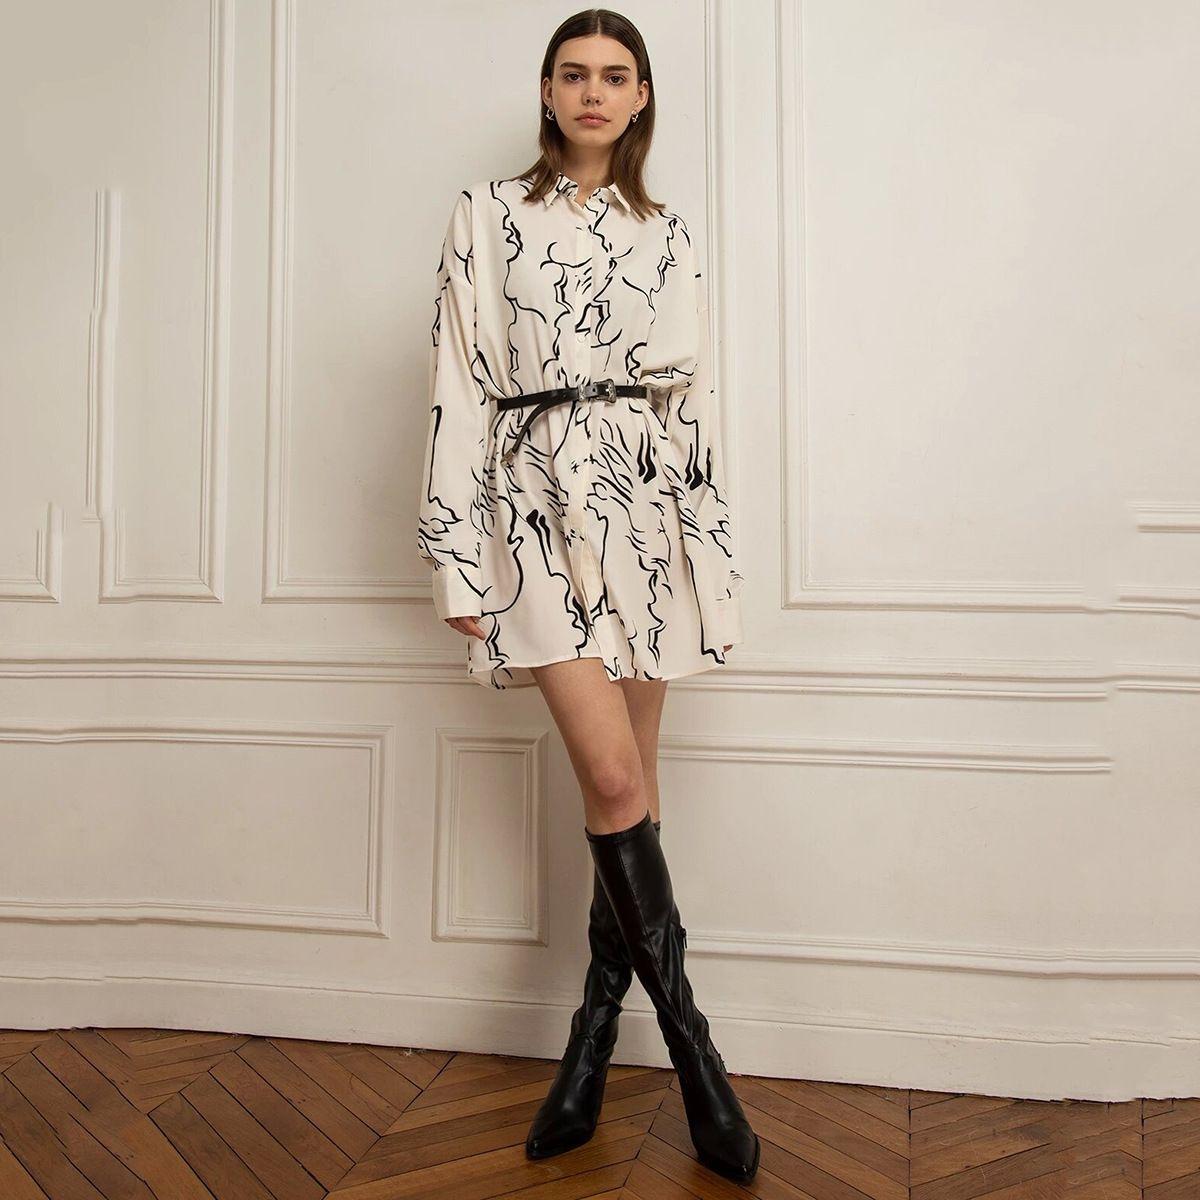 T9zvx HAODUOYI simple personality commuting style irregular pattern printing shirt dress long sleeve shirt style loose dress 2020